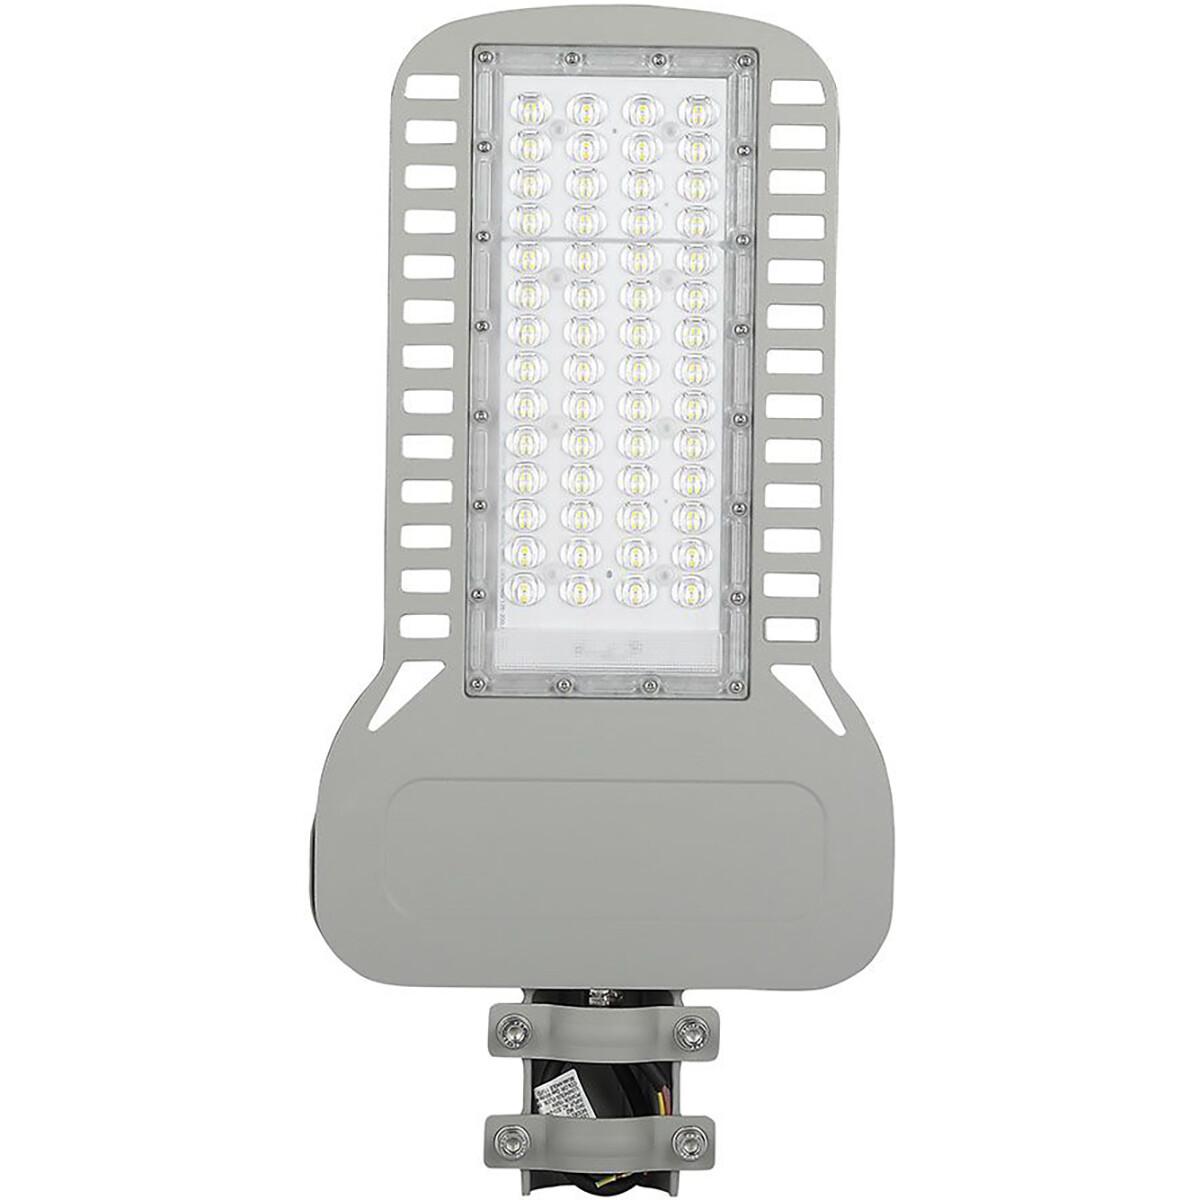 SAMSUNG - LED Straatlamp Slim - Viron Unato - 150W - Natuurlijk Wit 4000K - Waterdicht IP65 - Mat Gr